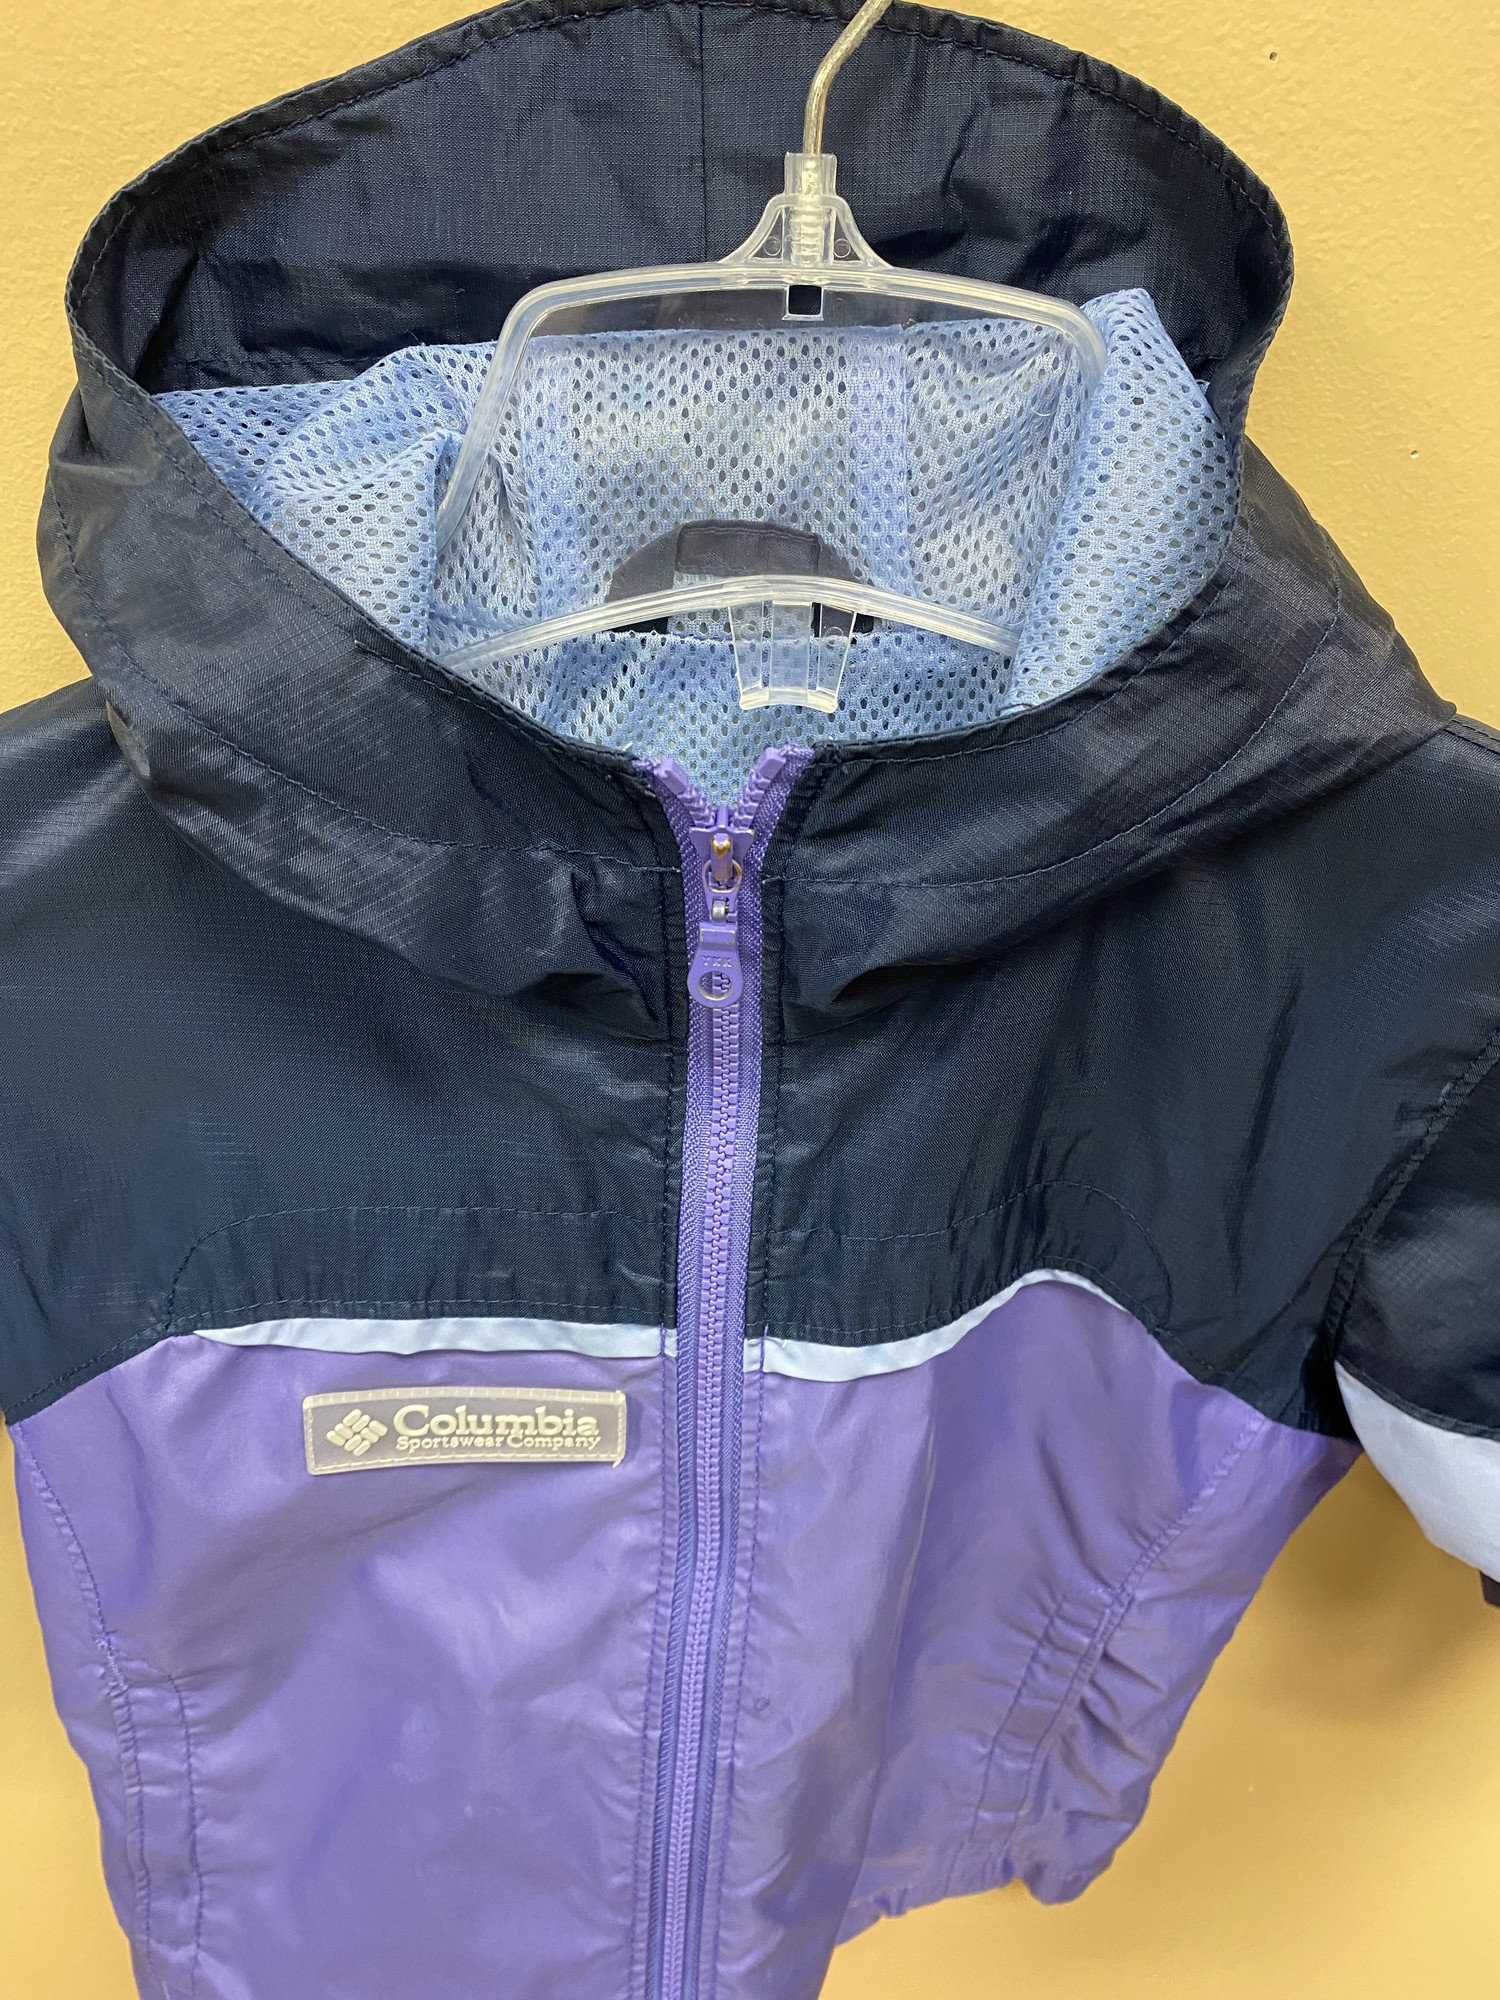 Columbia Spring Coat, Purple, Size: 3yrs